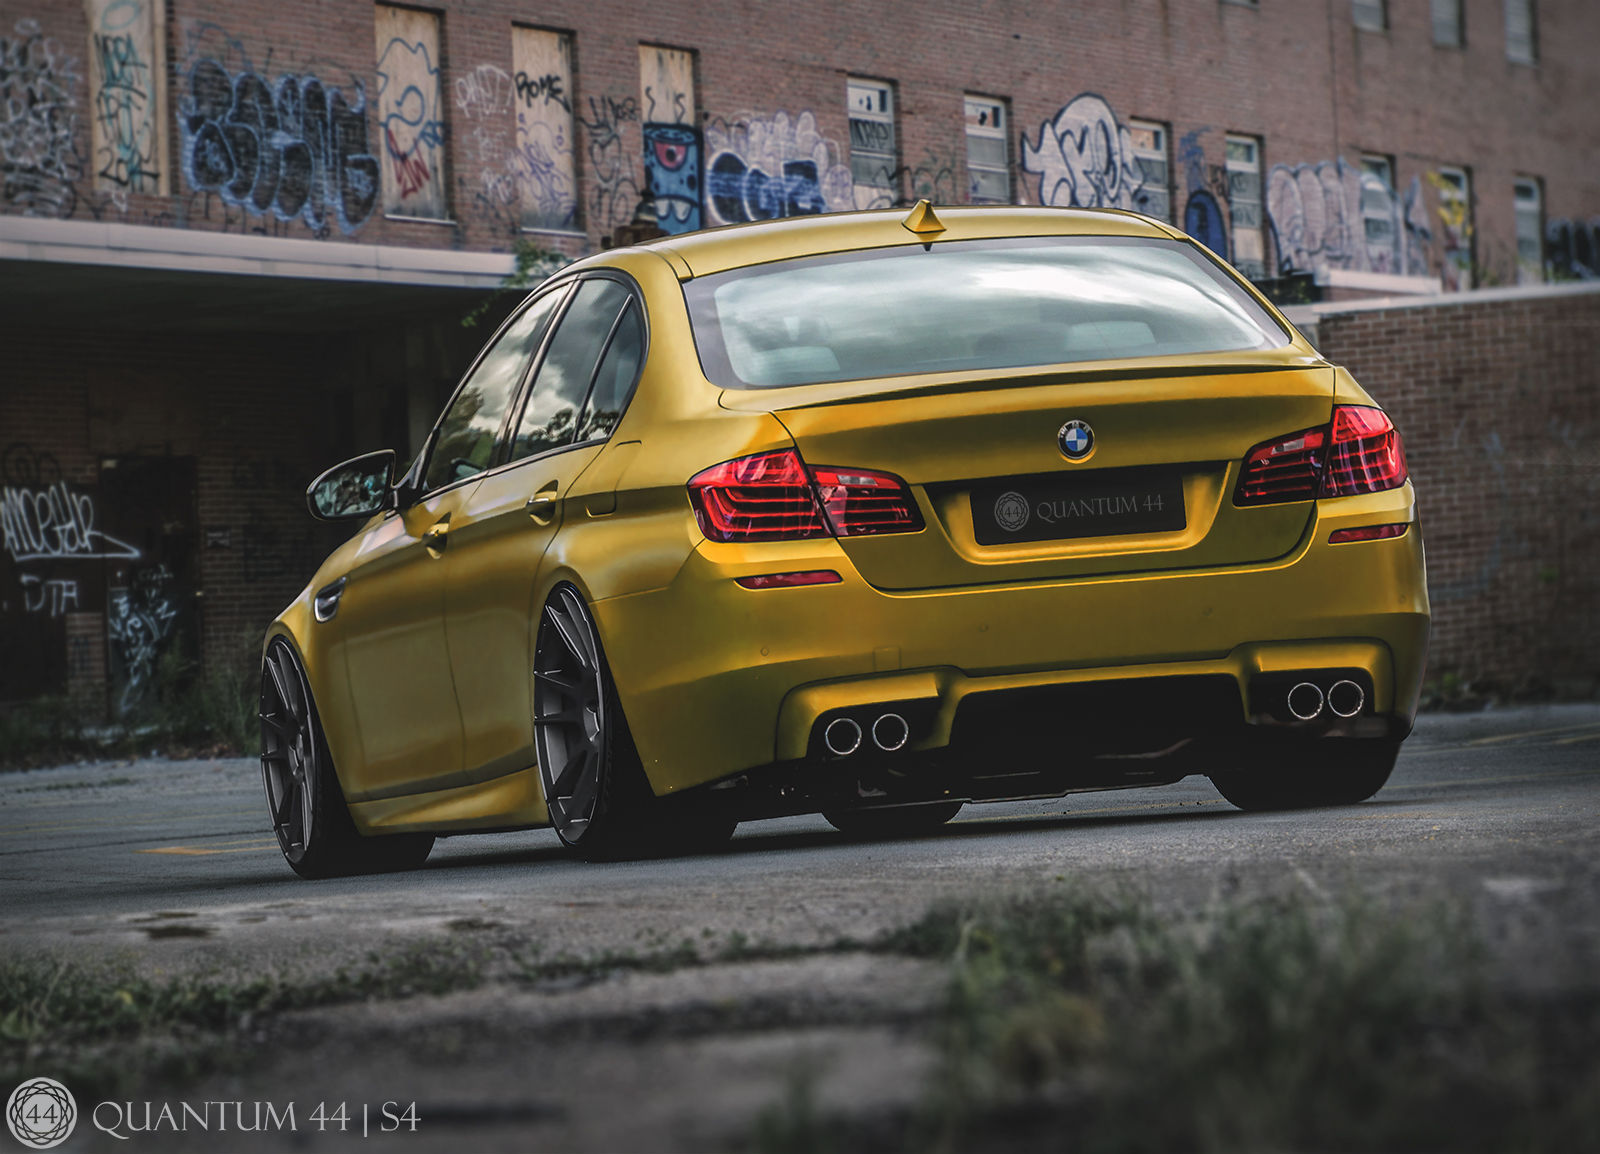 BMW M5   BMW M5 - Quantum44 S4